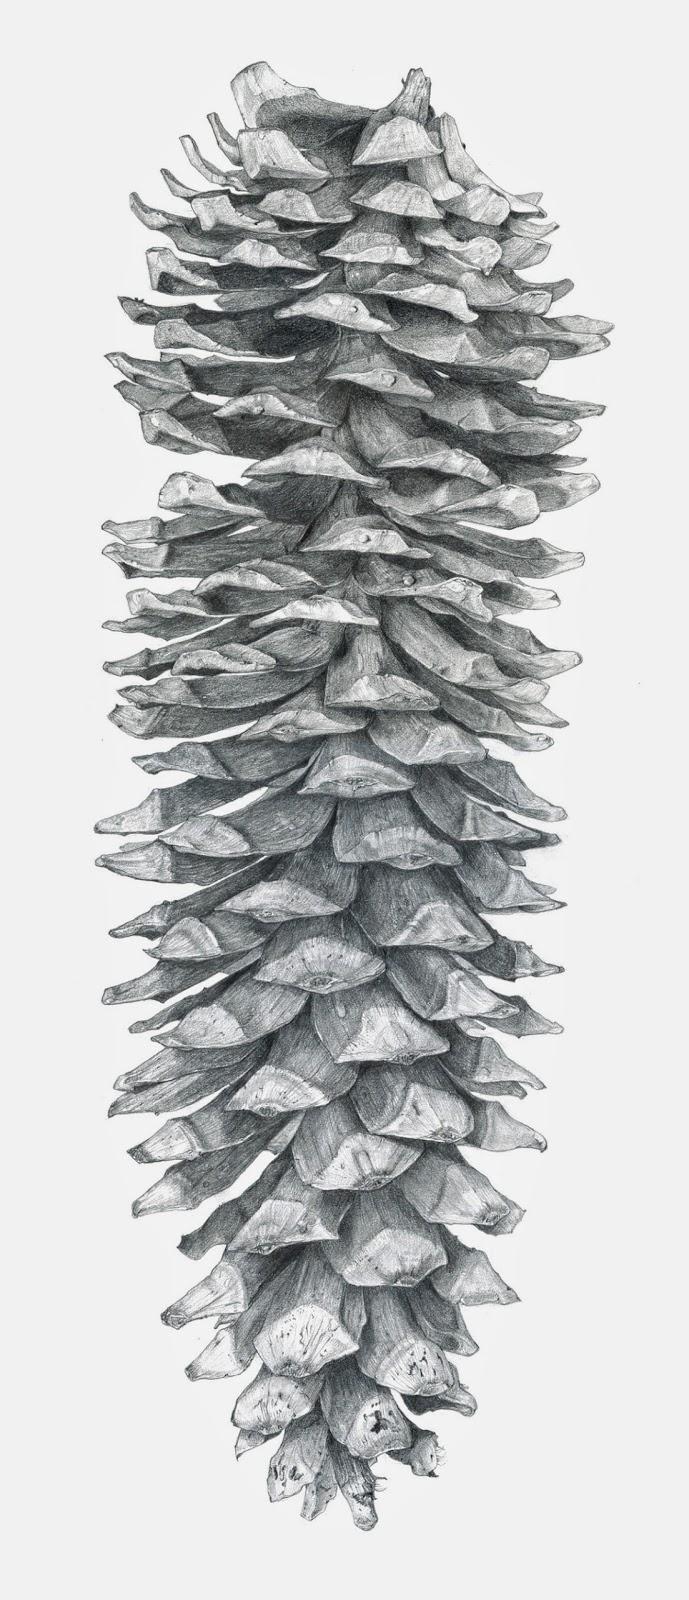 Drawn pine cone Drawing! Sugar Pine Sugar Melling: